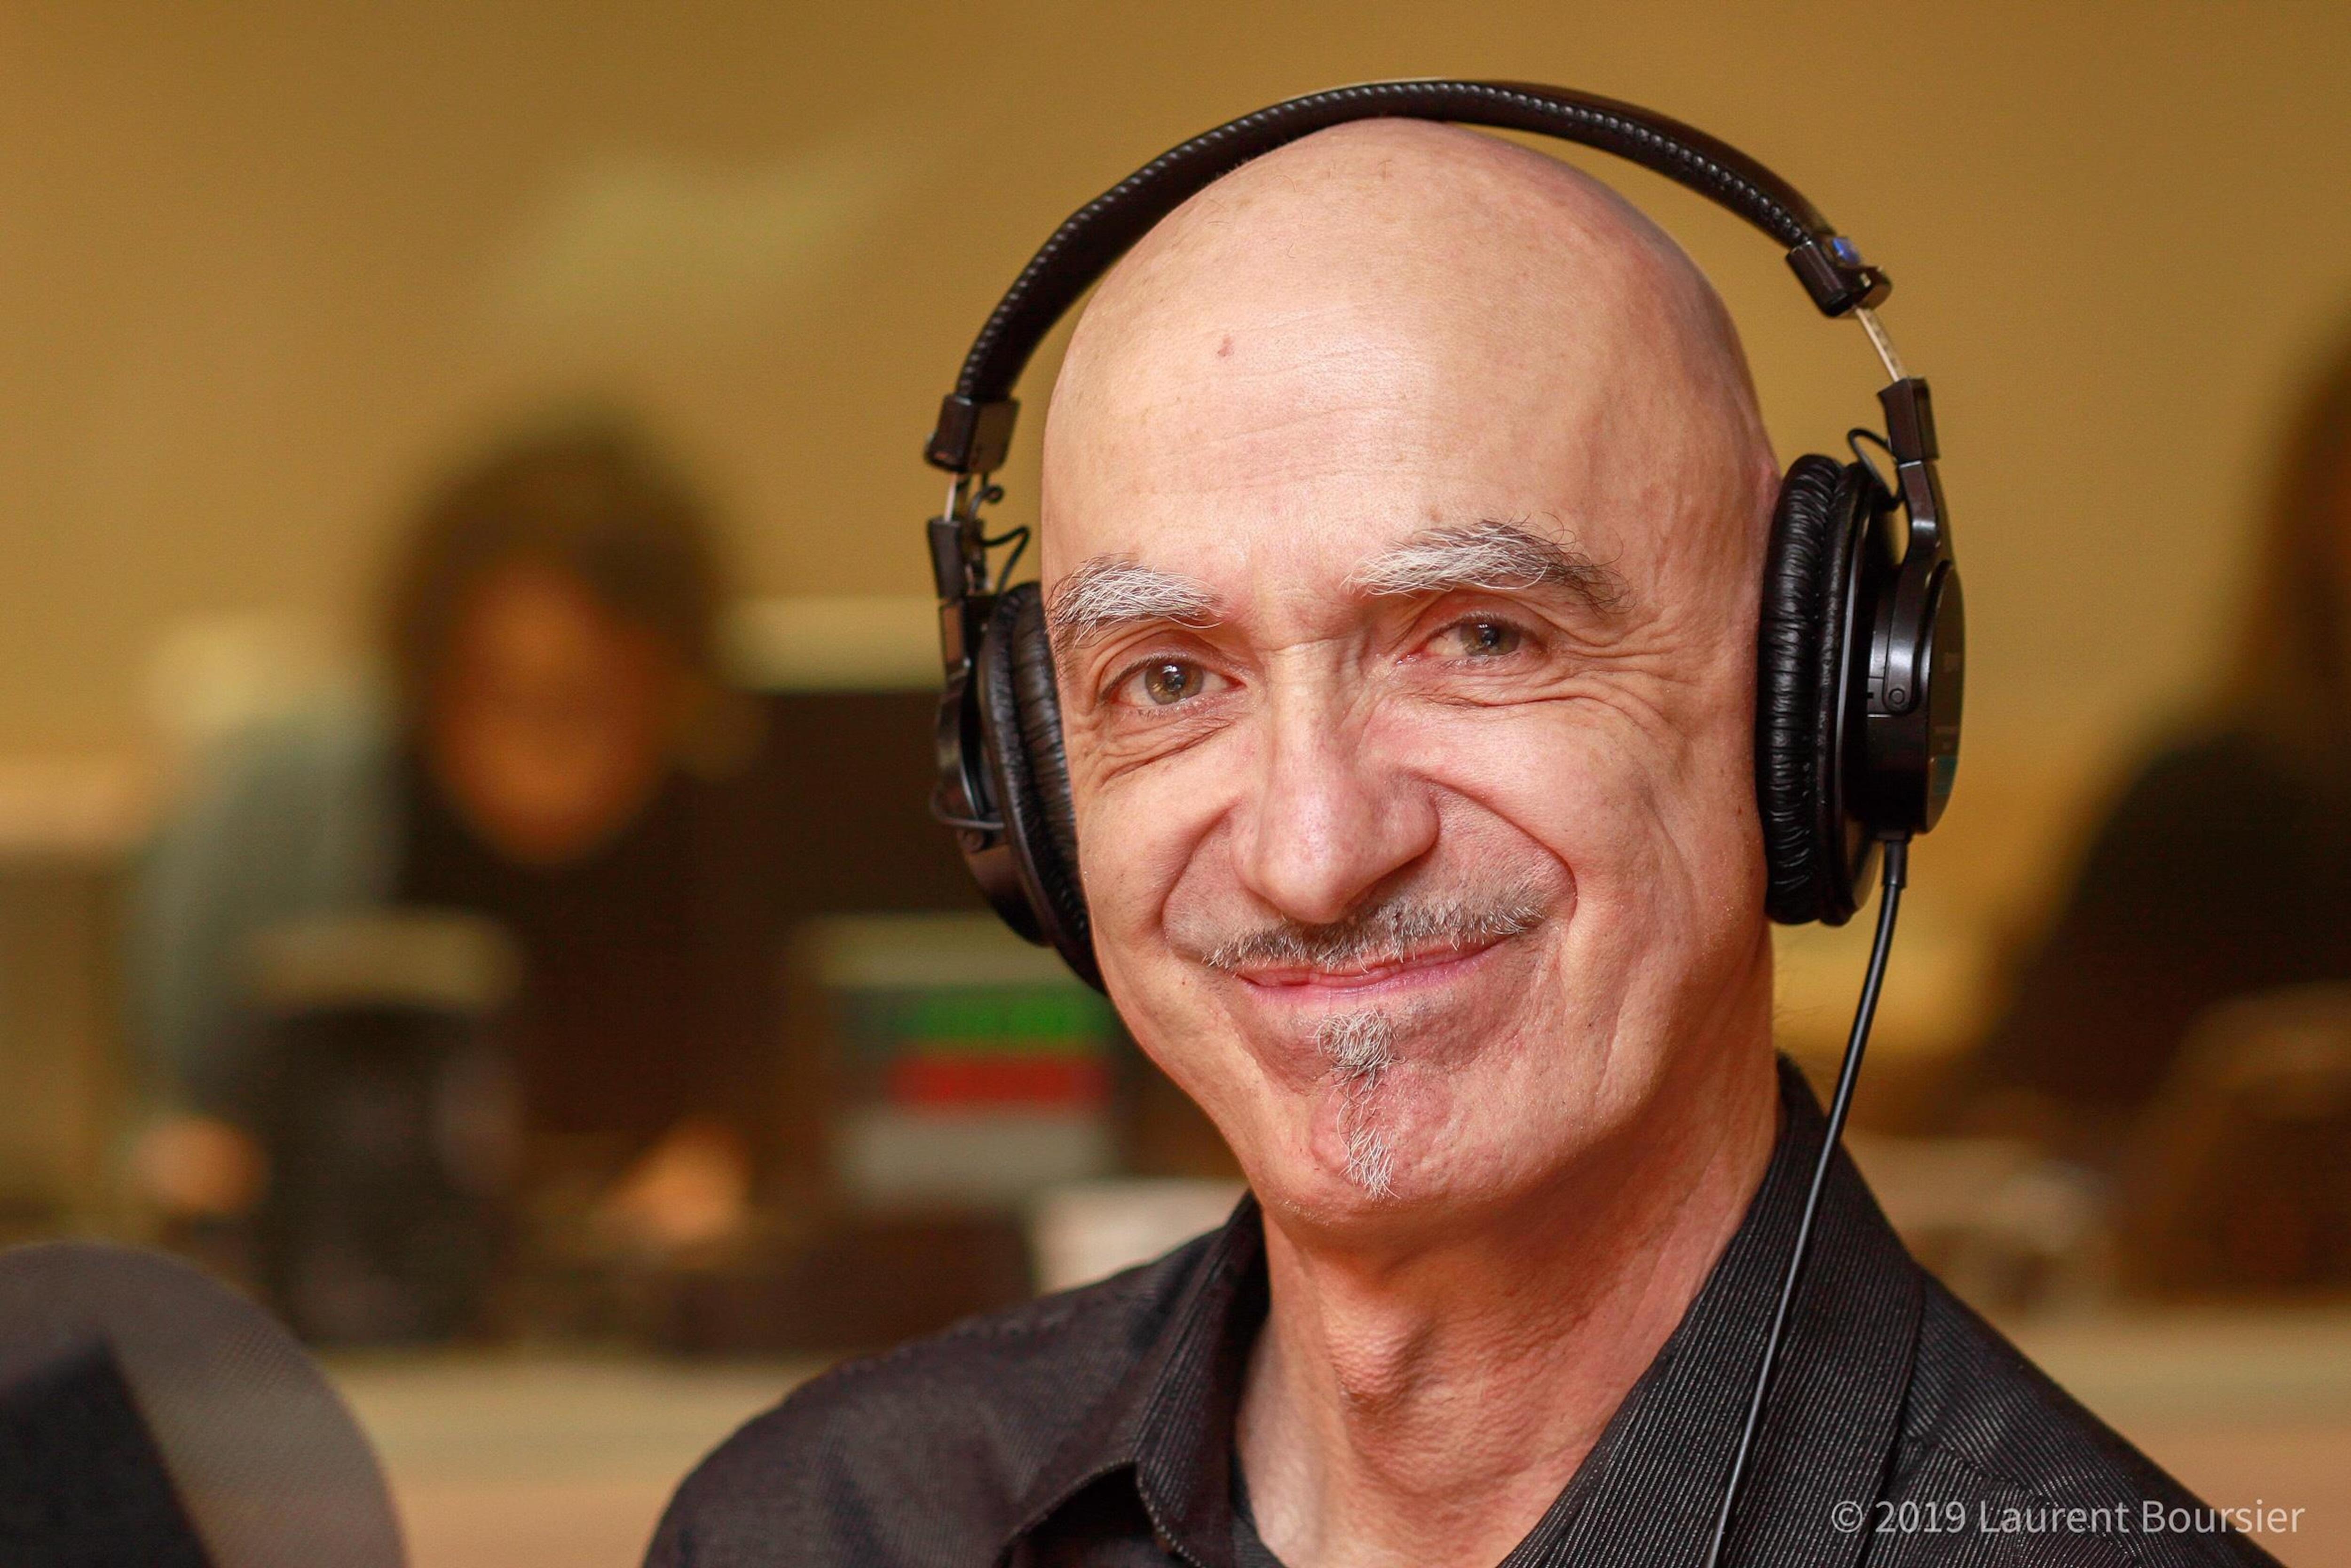 Michel Faubert au micro du studio 18 de Radio-Canada